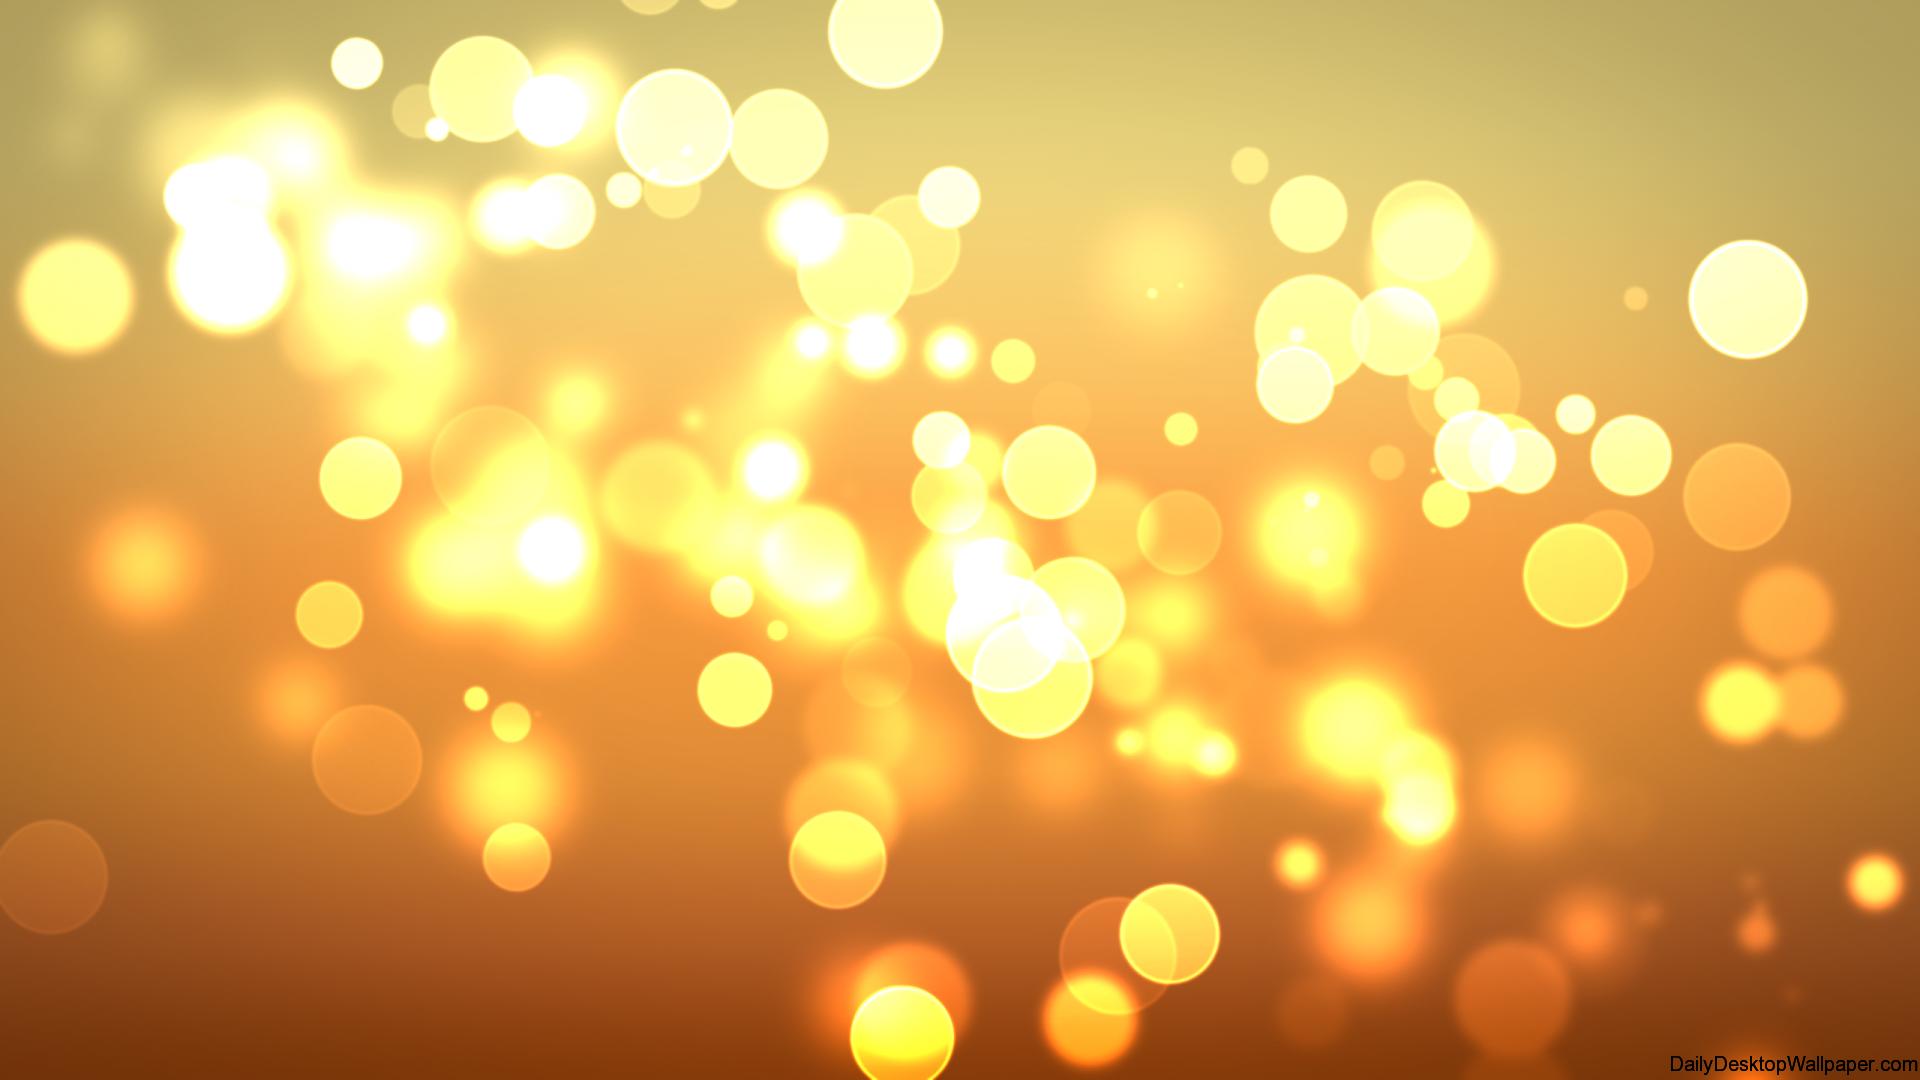 Light Speckle Wallpaper